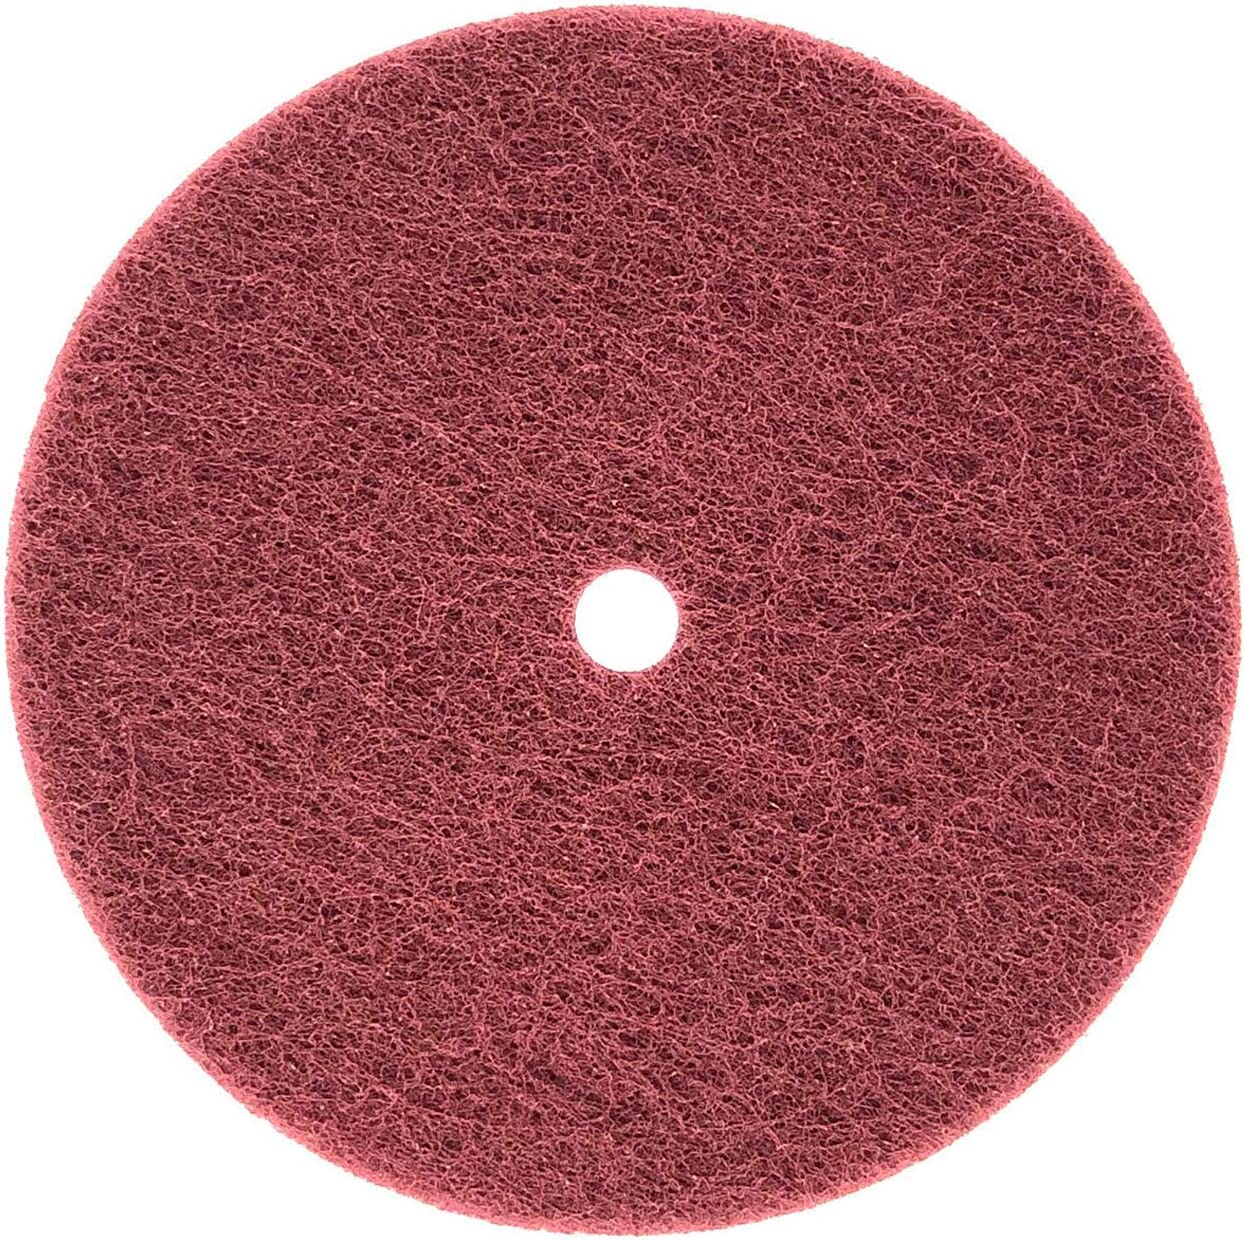 United Abrasives Max 70% OFF SAIT 77165 latest 6X1 2 Sand Light Discs Non-Woven wit